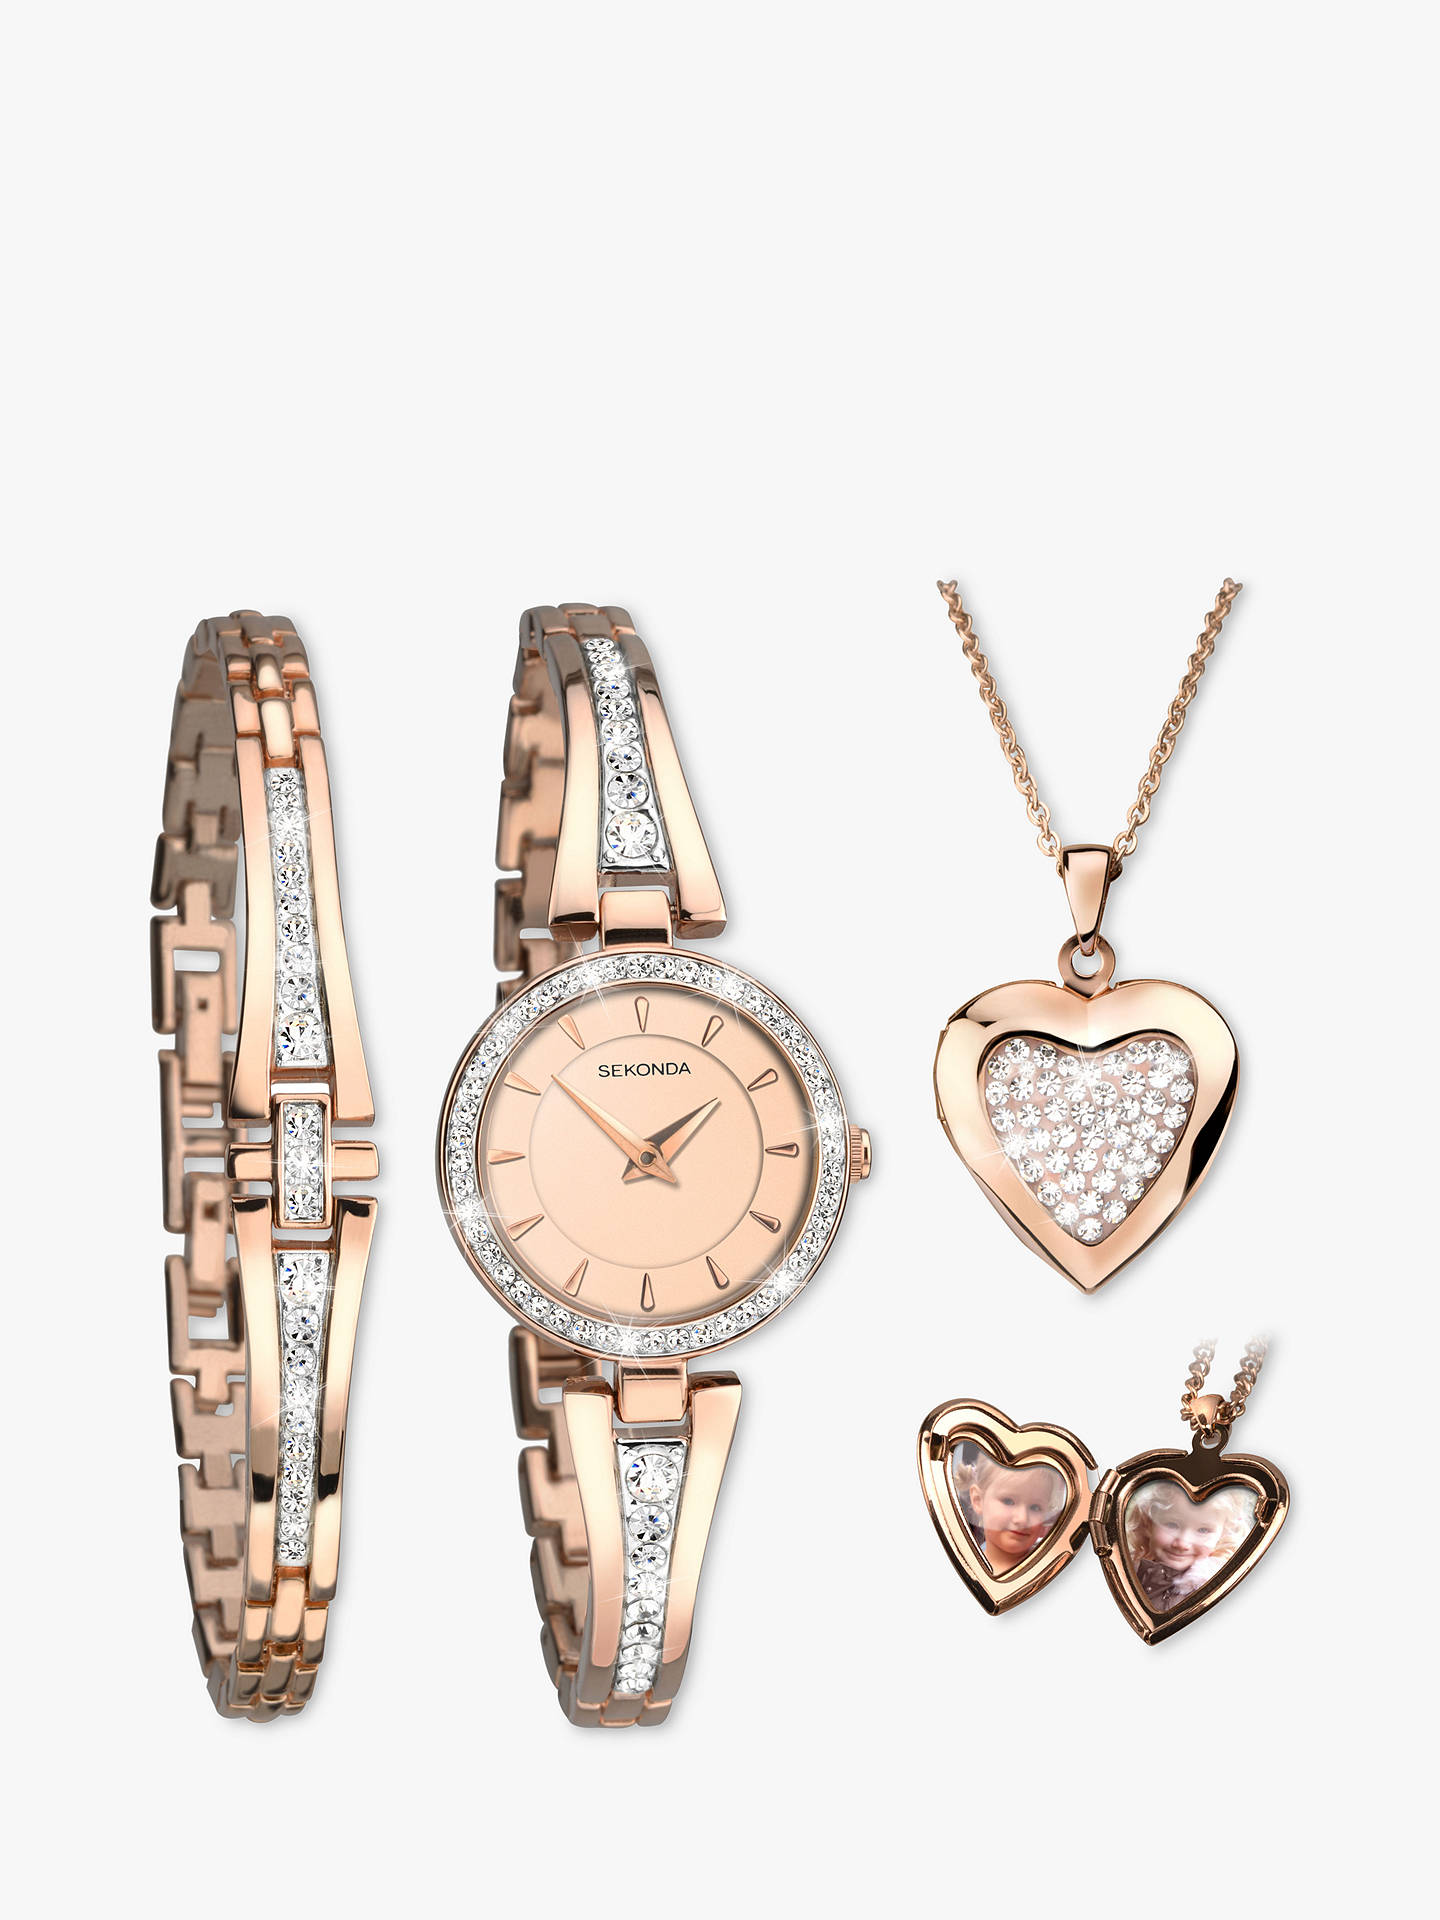 91836ac946dd6 Buy Sekonda 2533G.76 Women's Crystal Locket Pendant Bangle and Bracelet  Strap Watch Gift Set ...